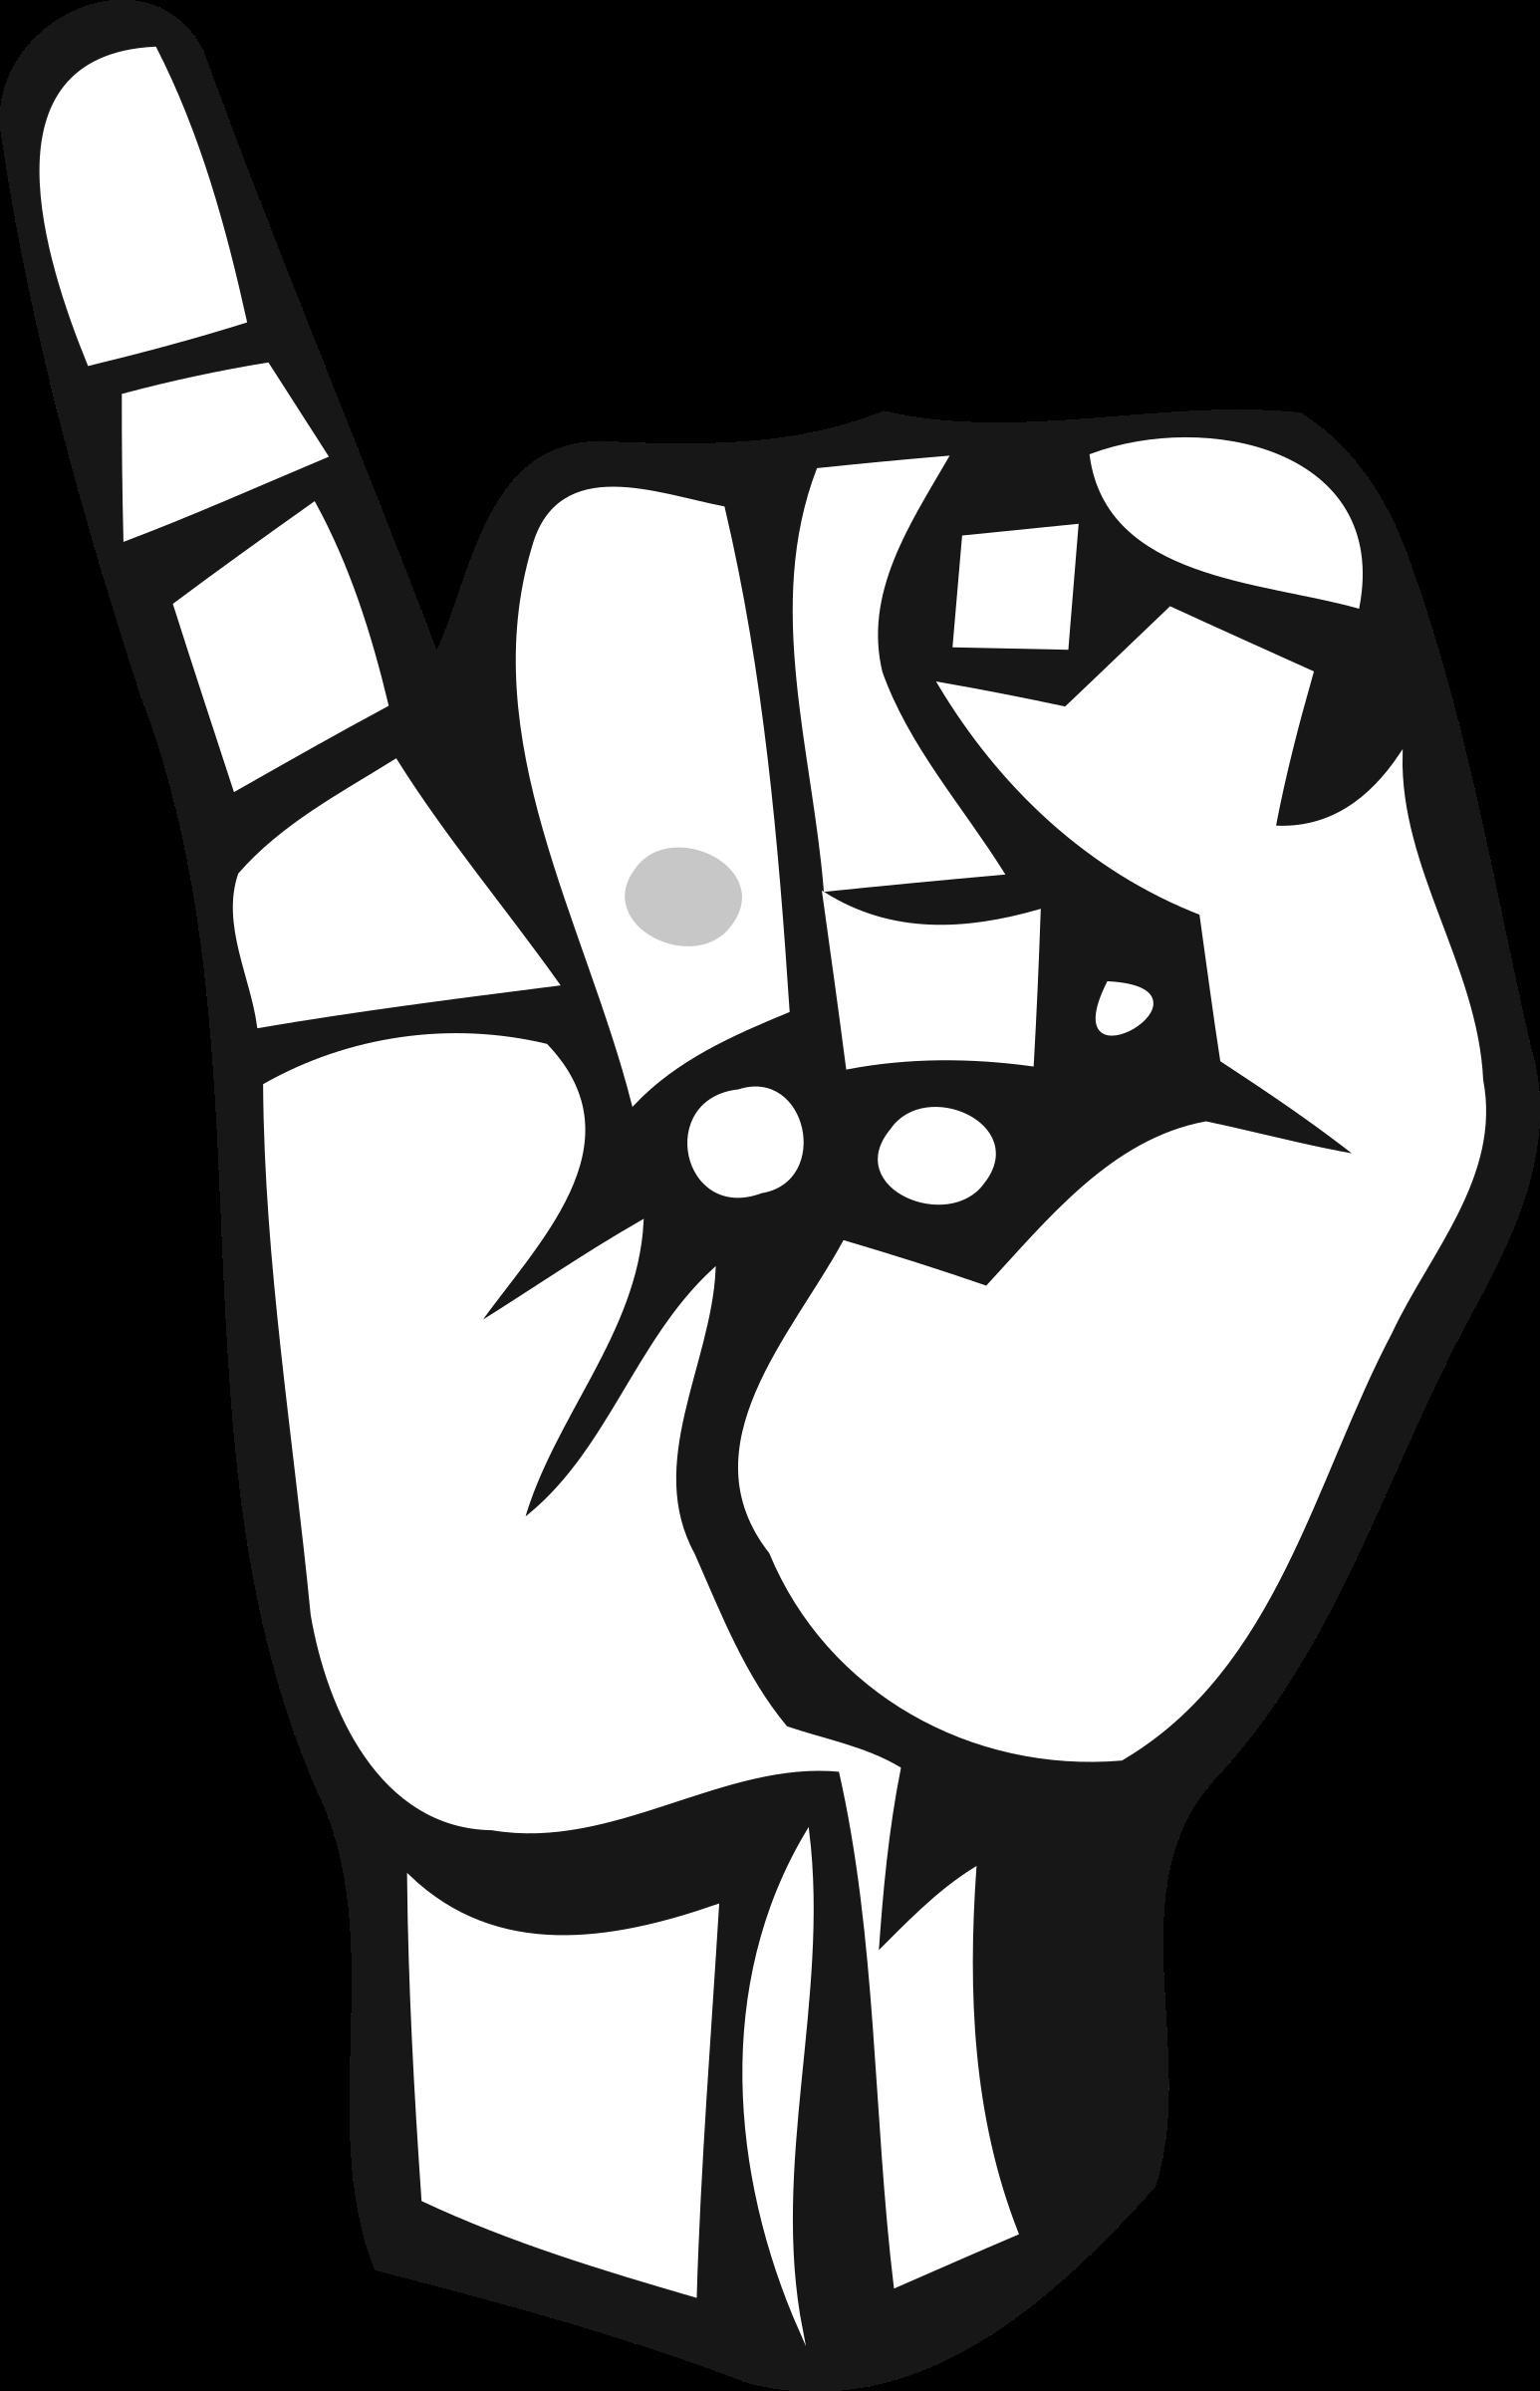 Clipart sign language alphabet vector Clipart - Deaf Alphabet I vector